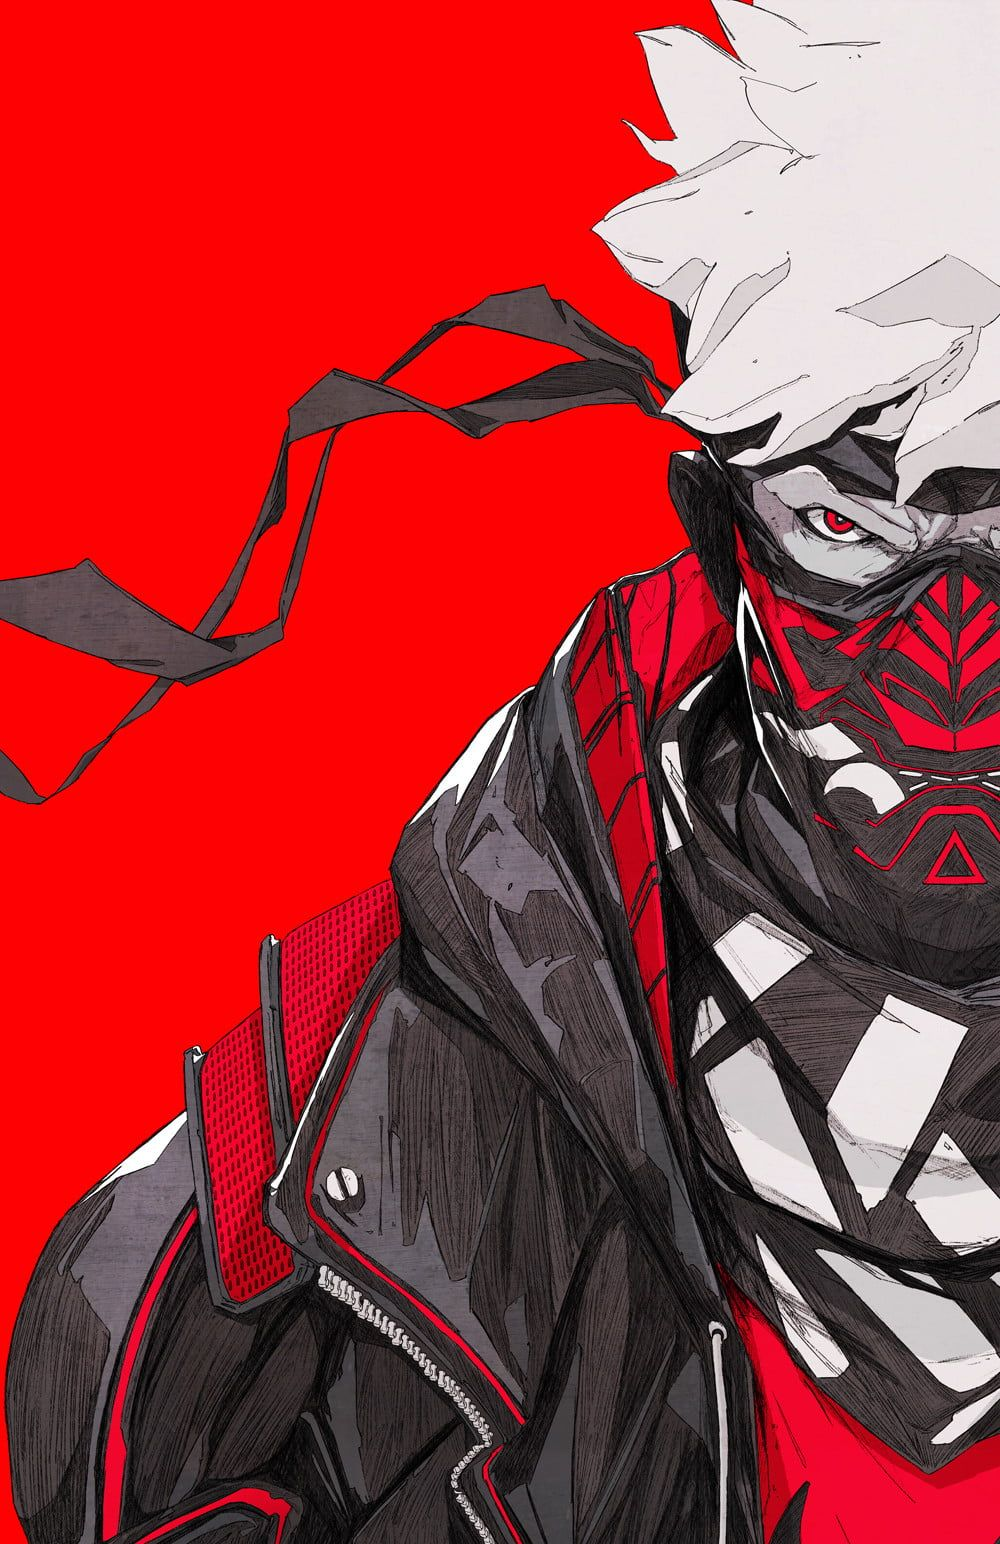 Chun Lo Artwork Illustration Digital Art Mask Warrior Cyberpunk Oni Mask Japan Red Background Sketches 2d Ninja Art Samurai Art Anime Character Design